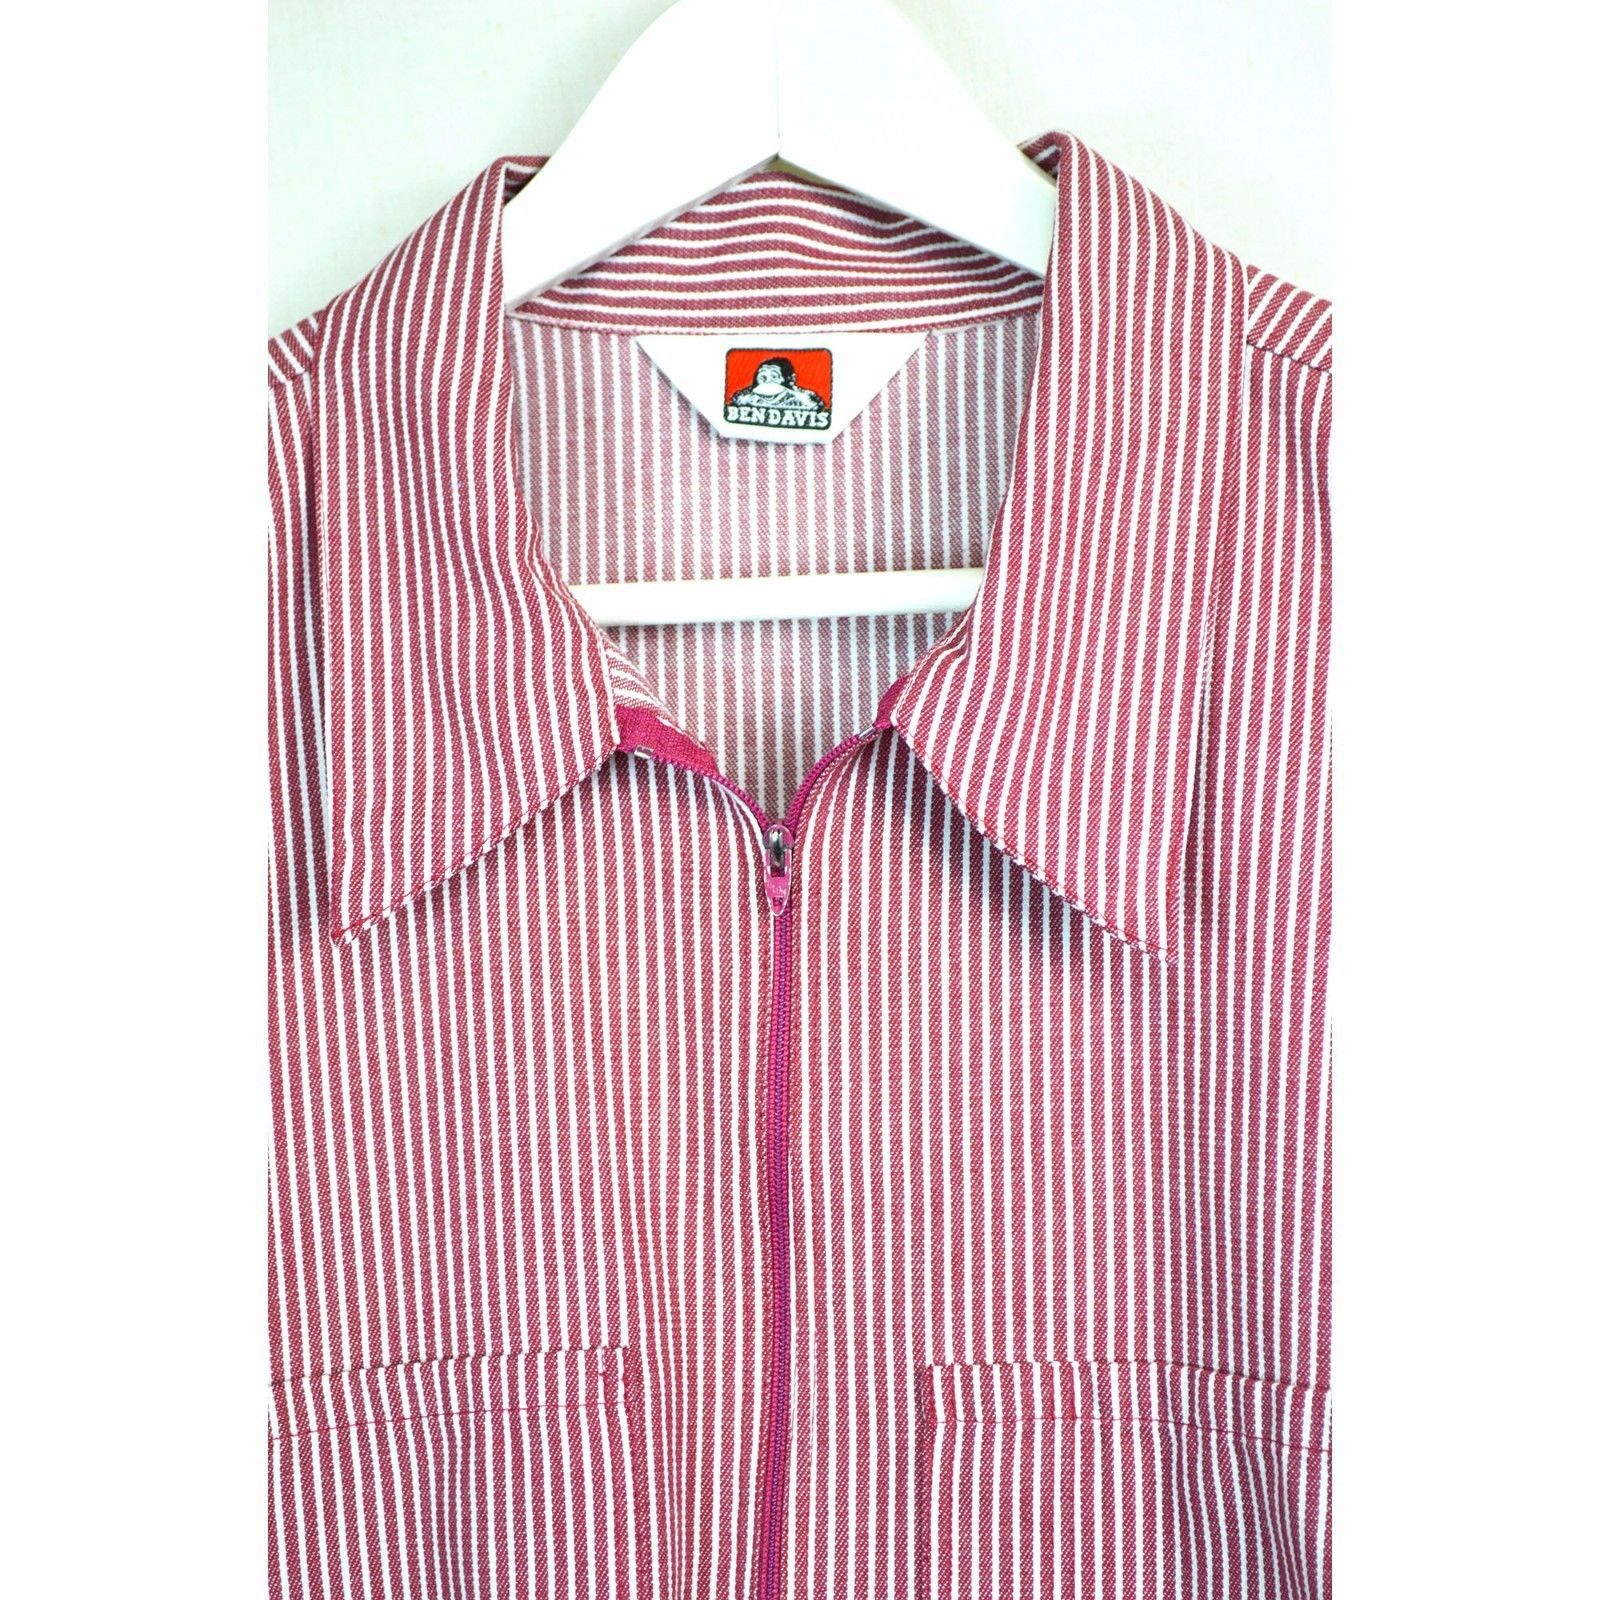 6f74f6e7ed BEN DAVIS Size XXXL 3X SHIRT Short Sleeve 1/4'' Zip Red White Stripe  Pullover